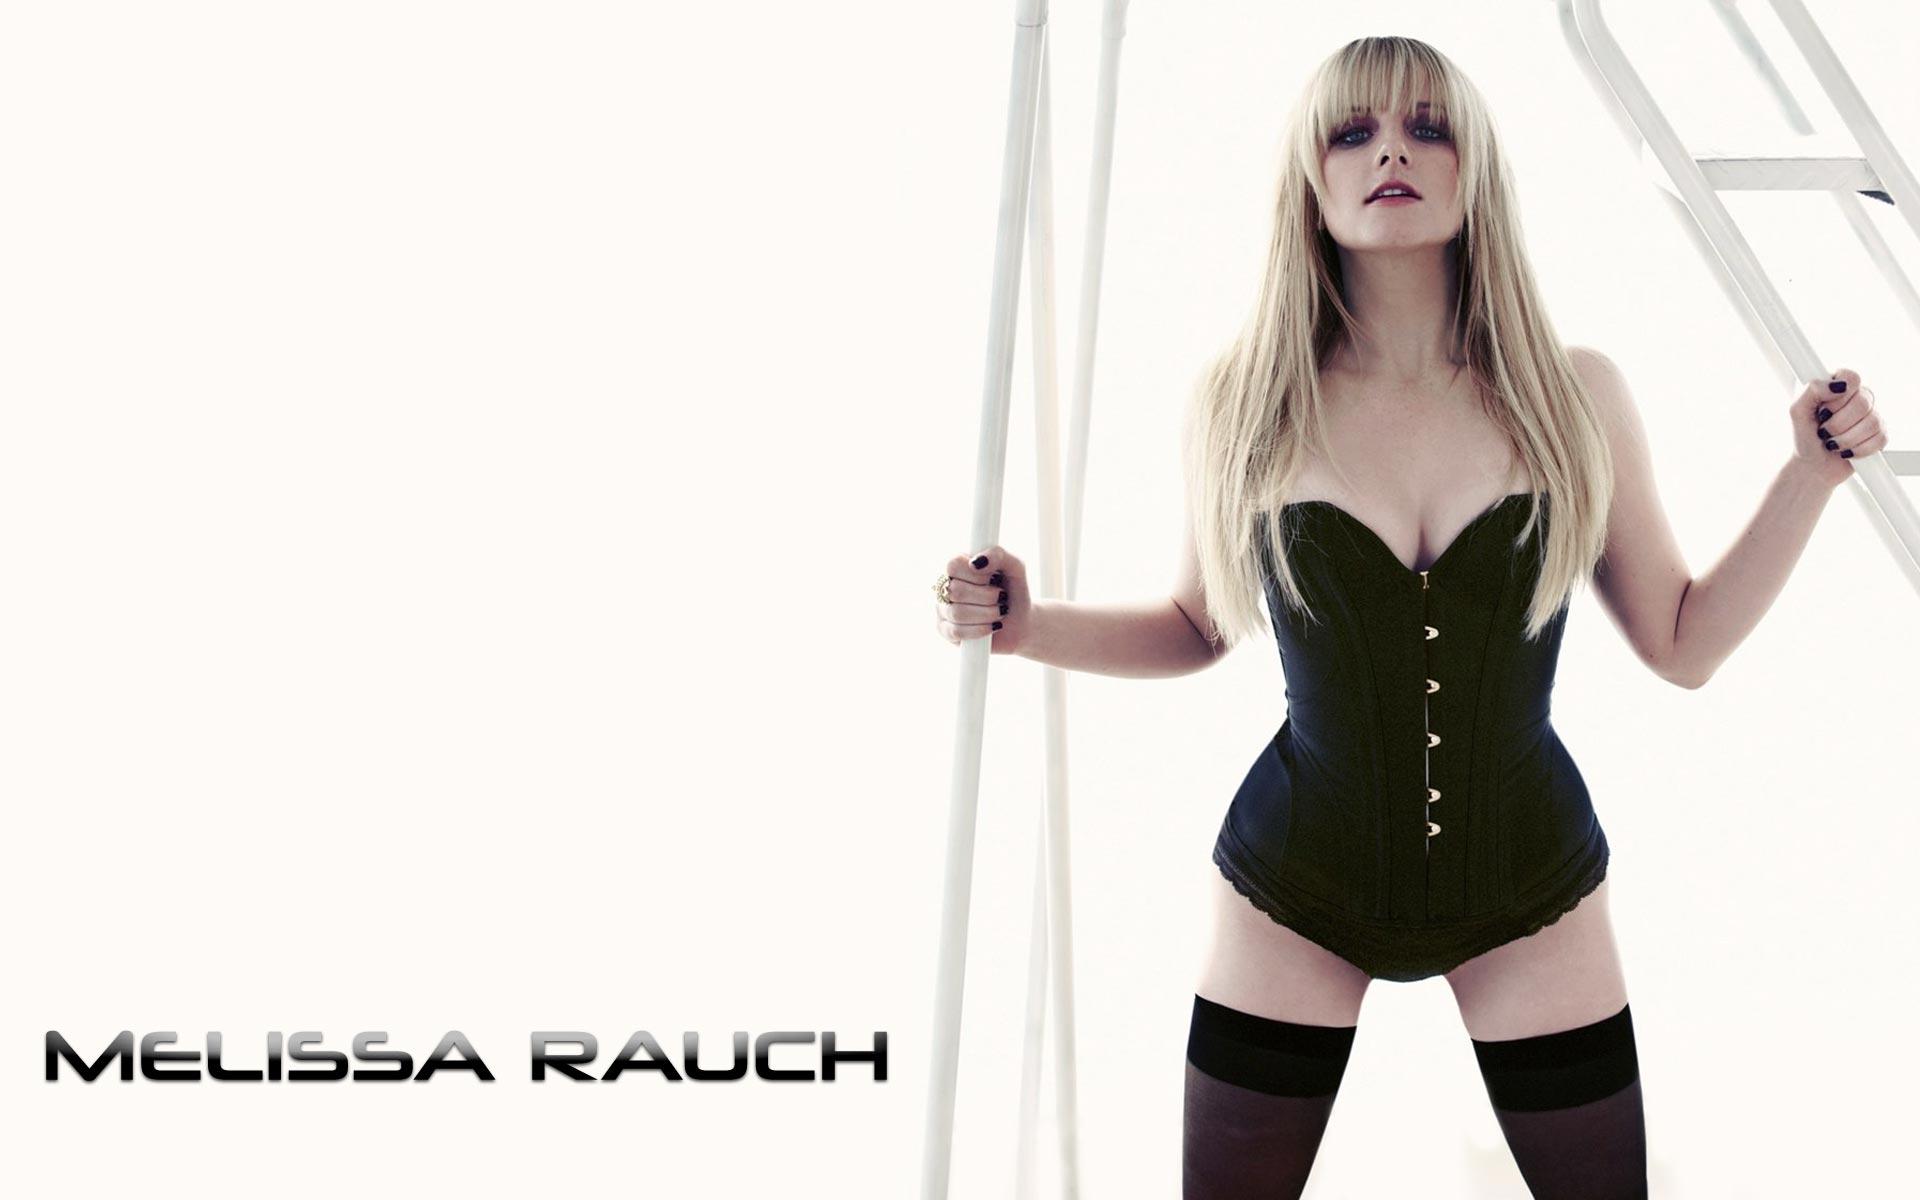 Melissa Rauch Hot Wallpapers 8